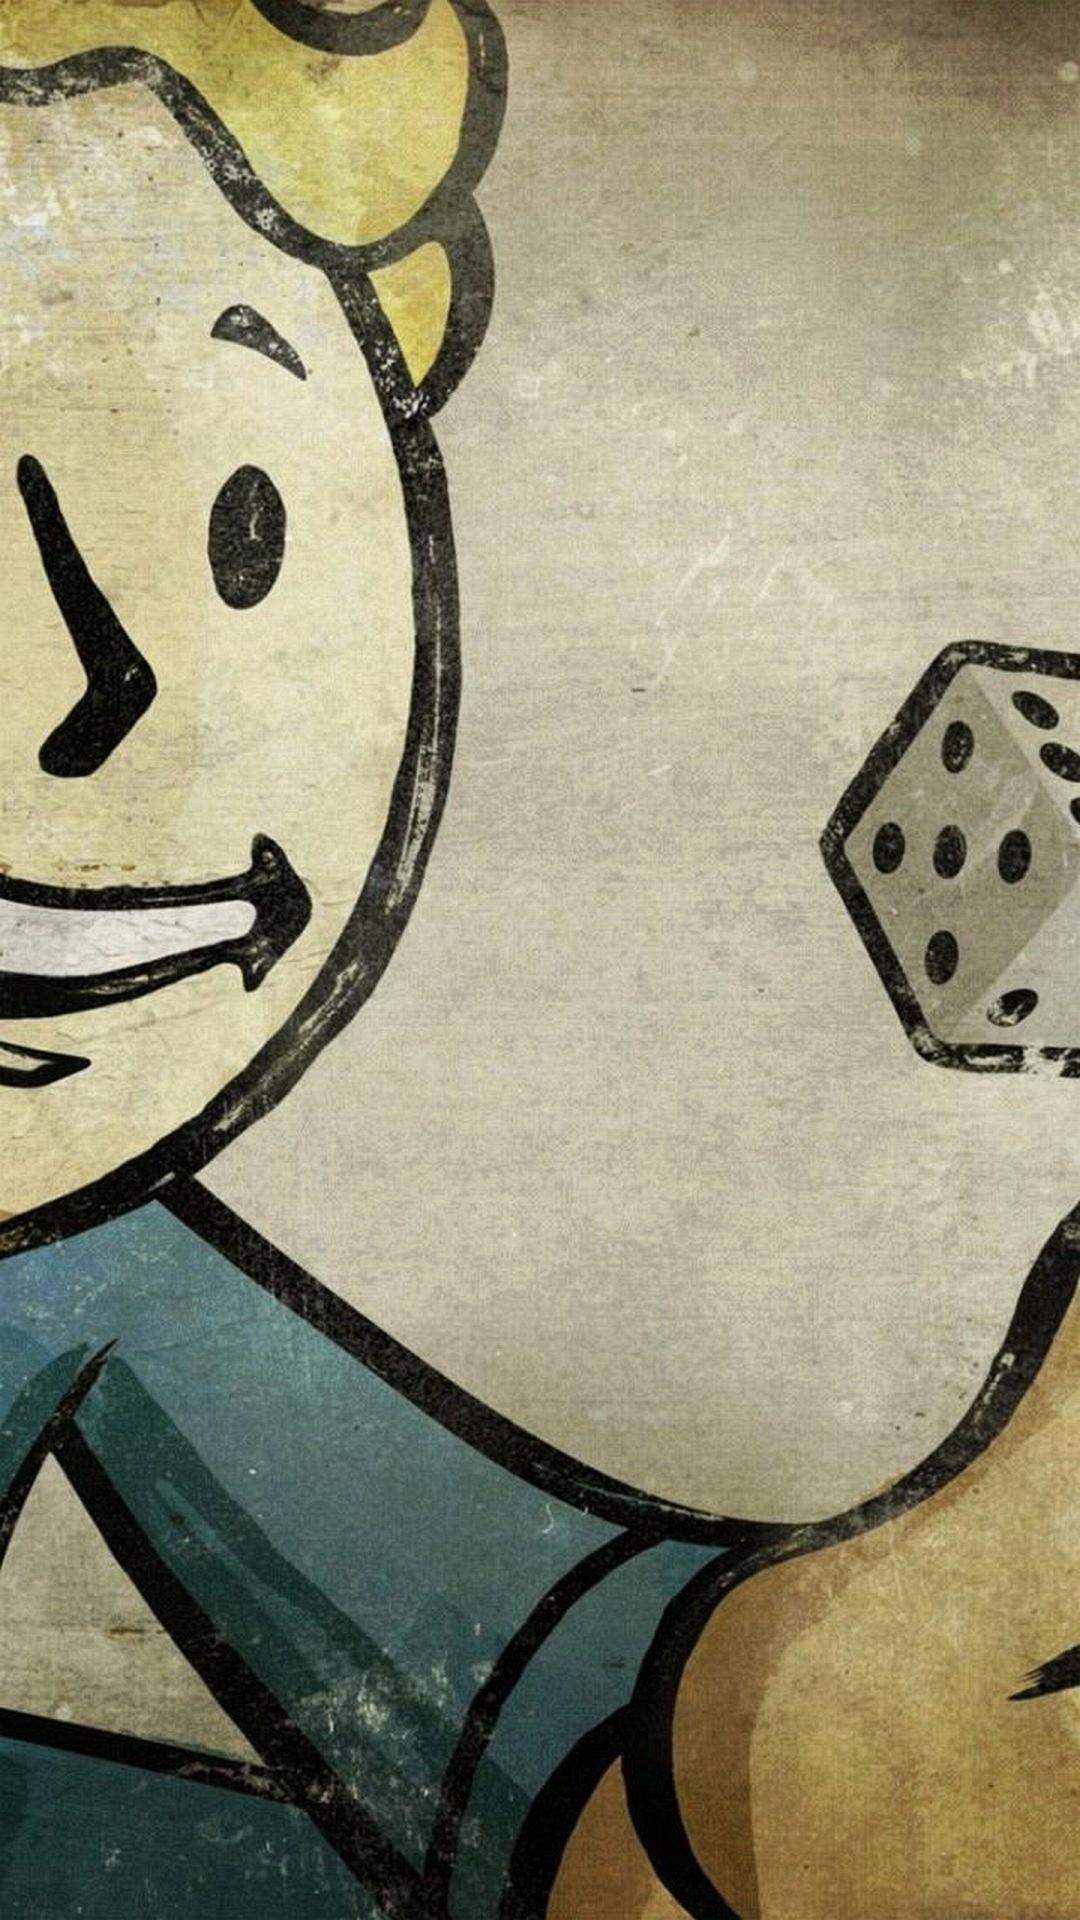 Fall Out Boy Wallpaper Iphone 6 Fallout 4 Vault Boy Wallpaper 74 Images